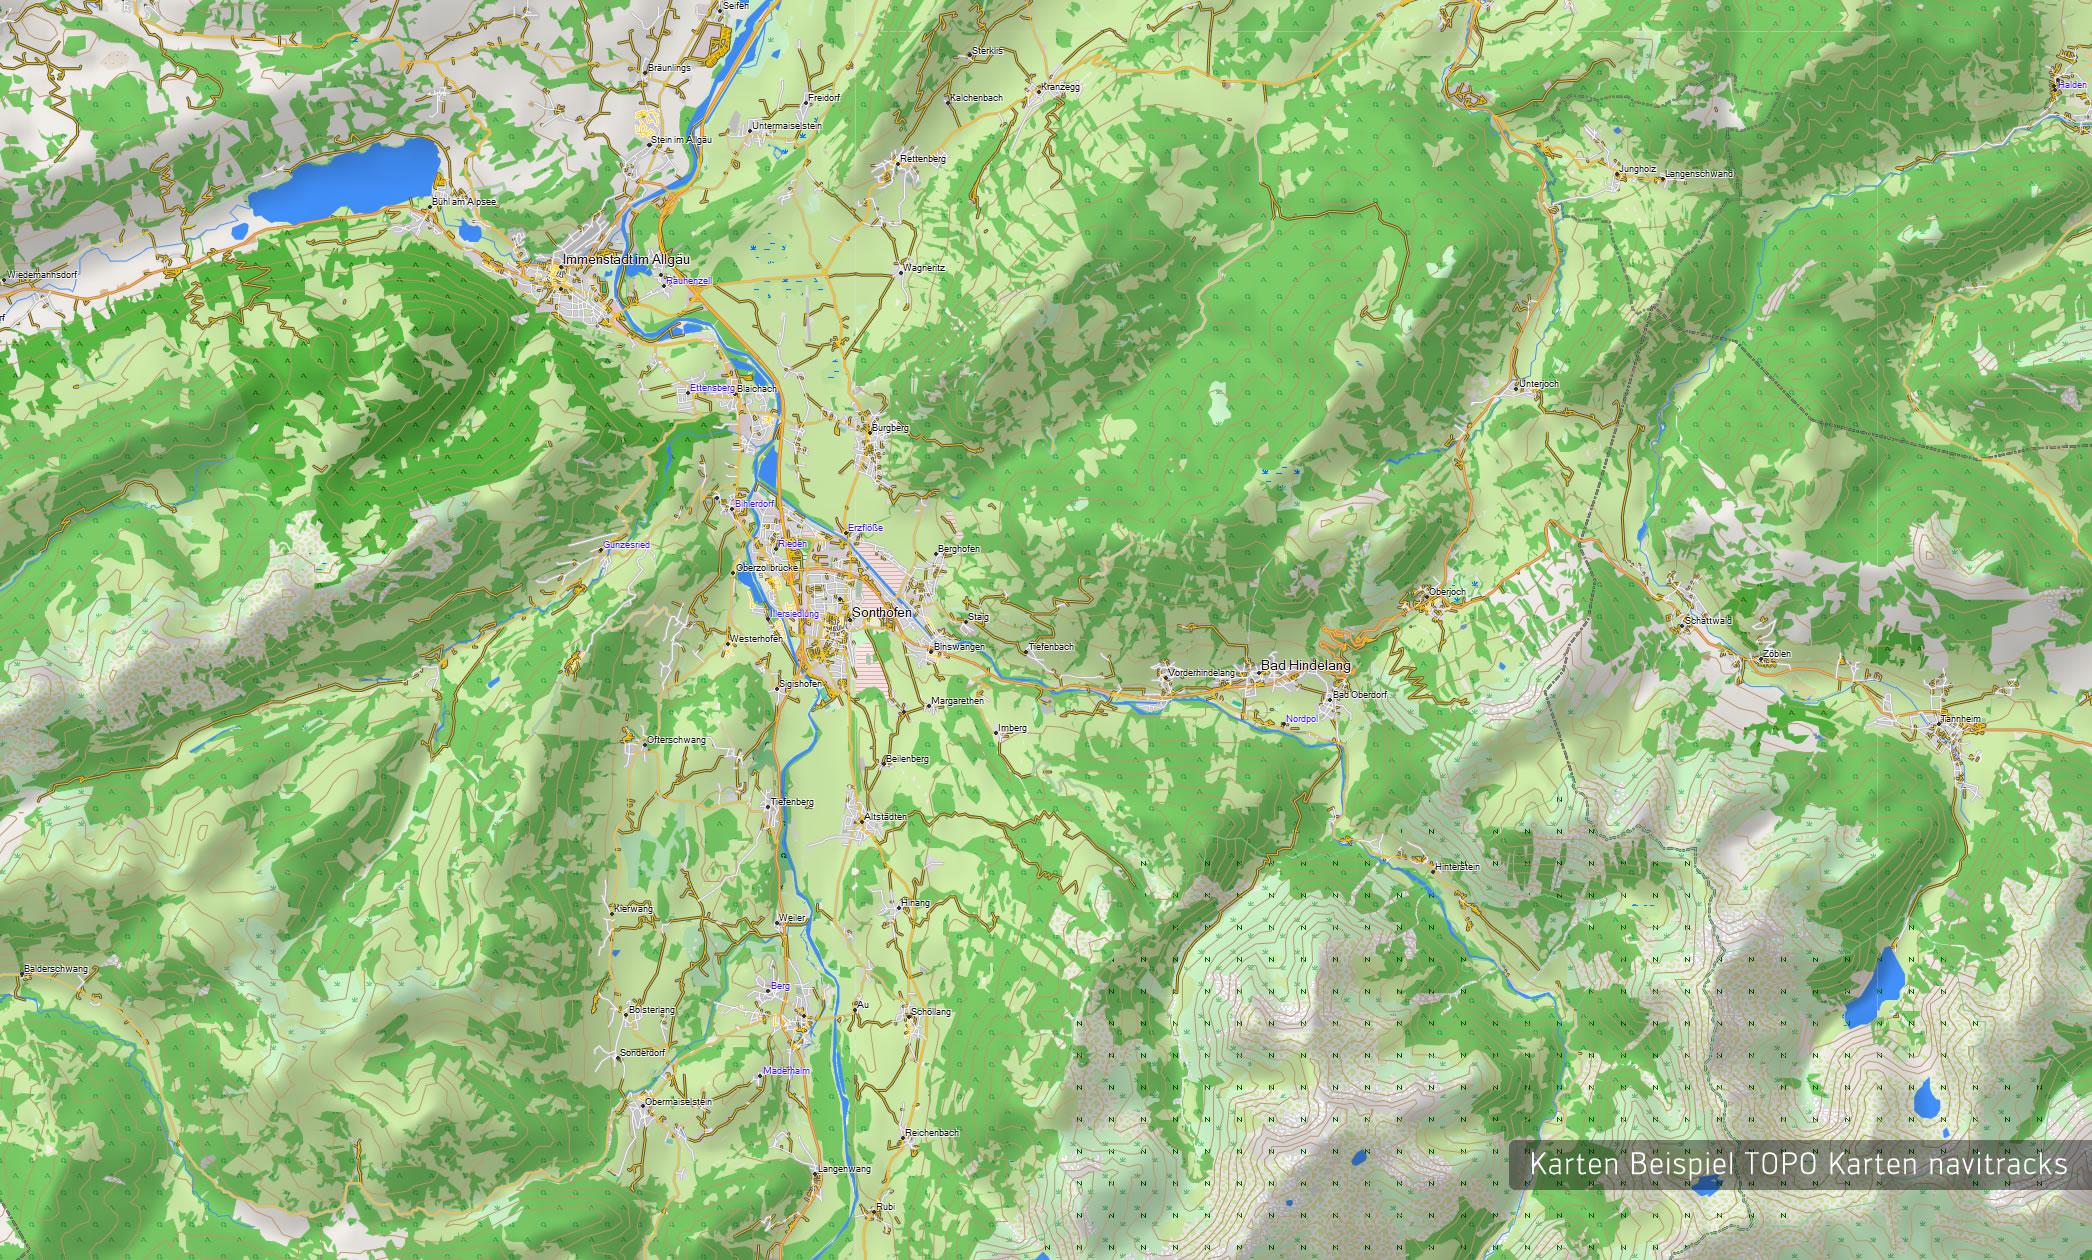 Alpen Topo Gps Karte Garmin Deutschland Schweiz Italien